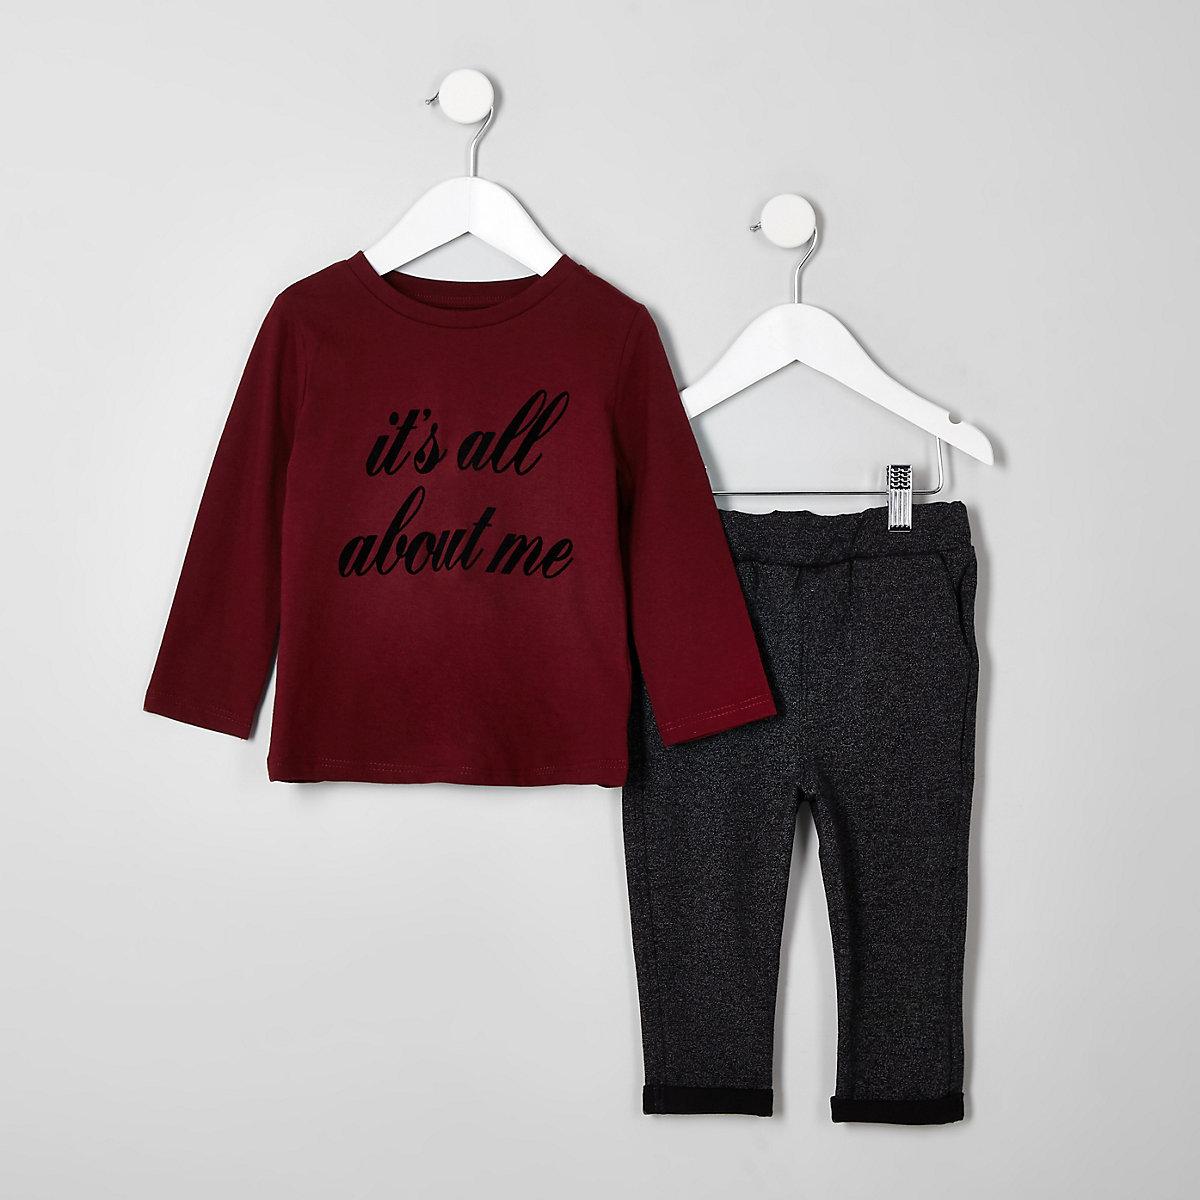 Mini boys burgundy T-shirt outfit